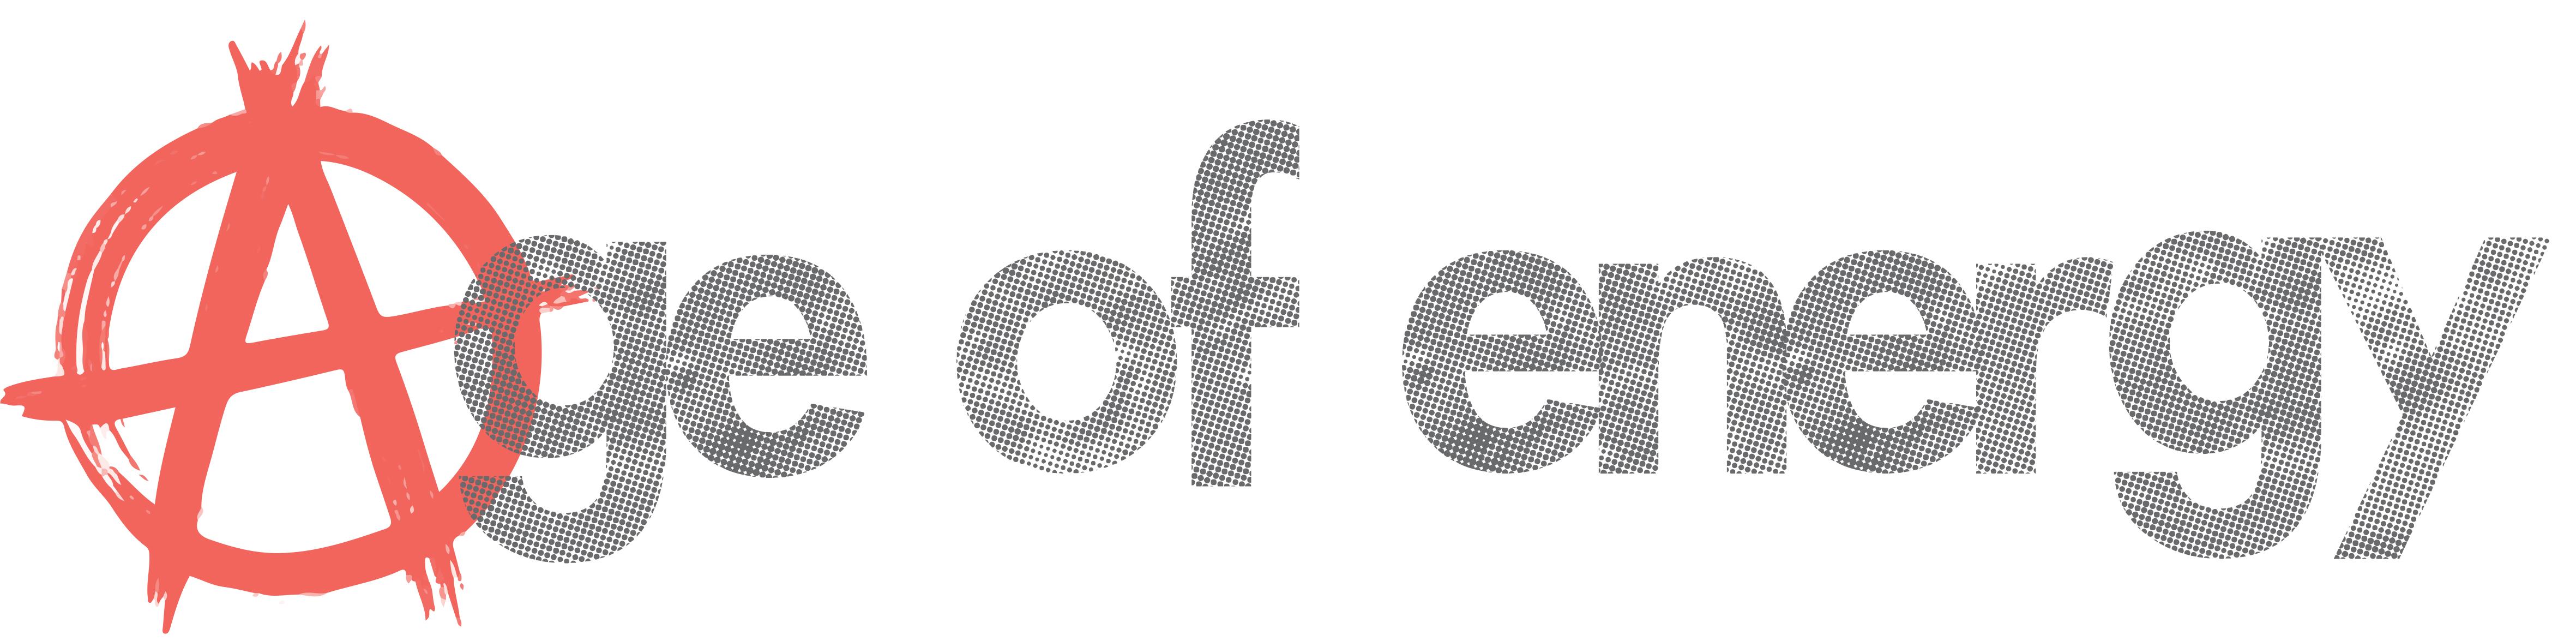 age-of-energy-logo